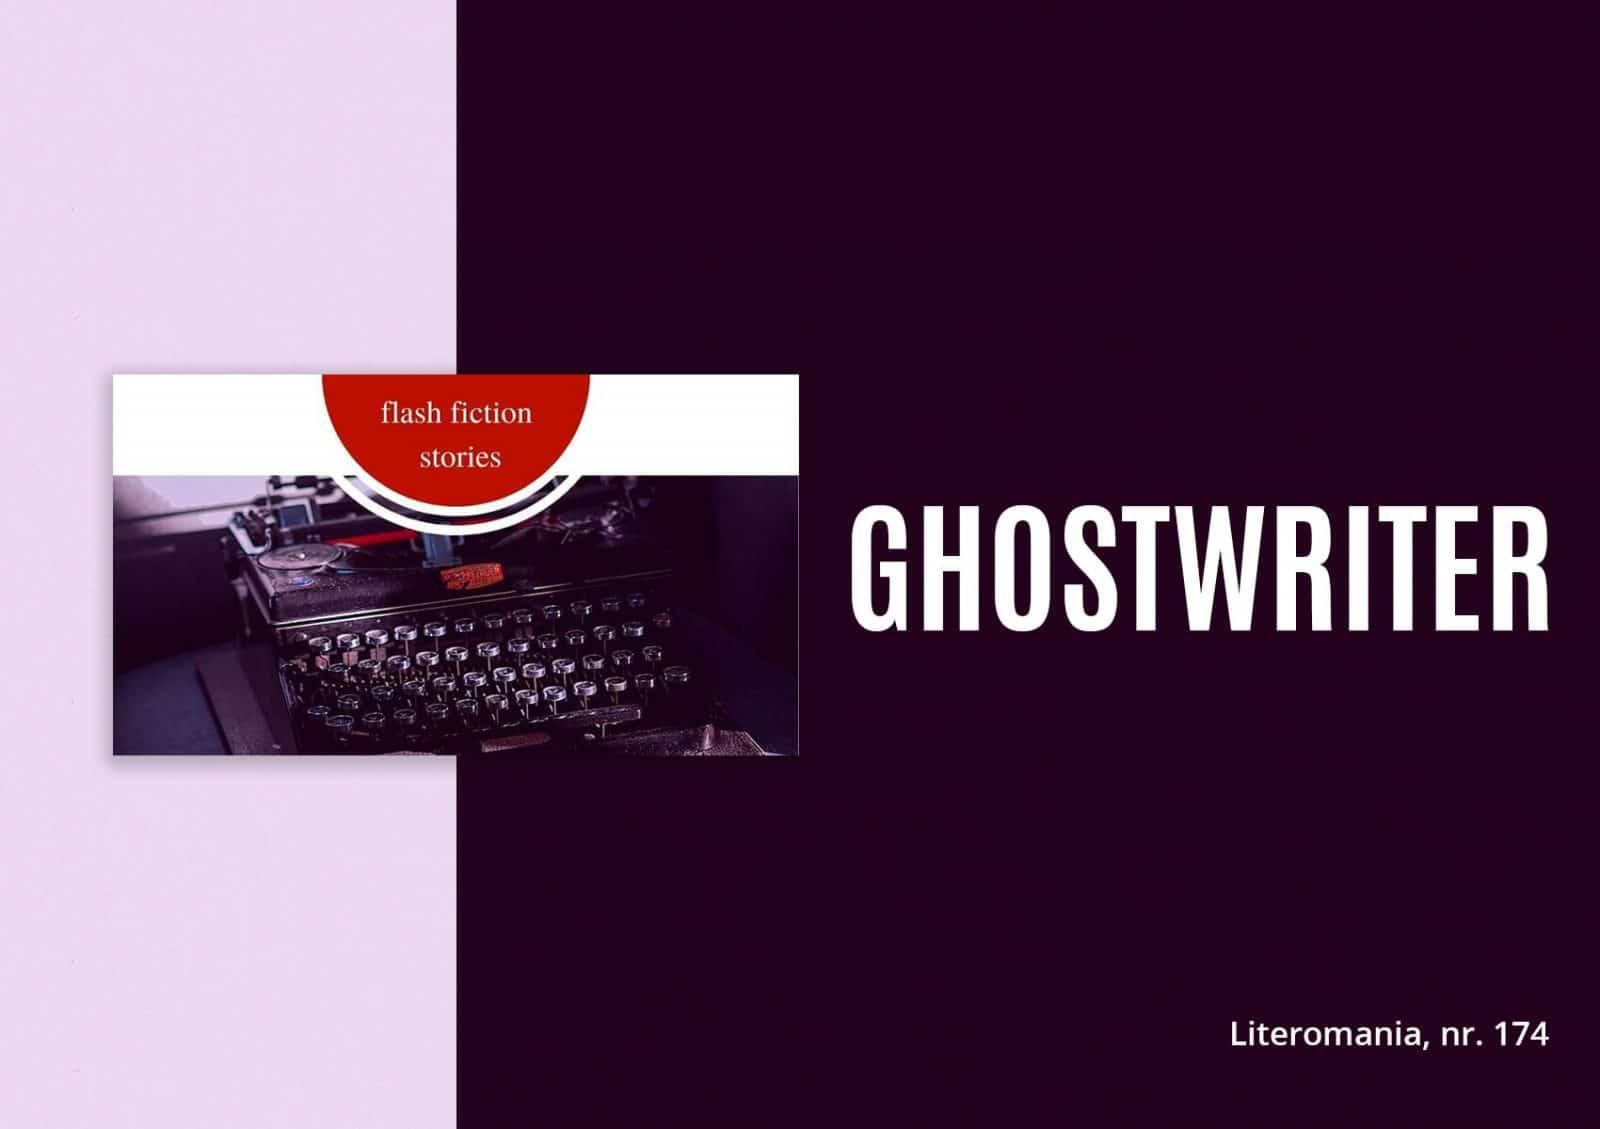 ghostwriter-literomania